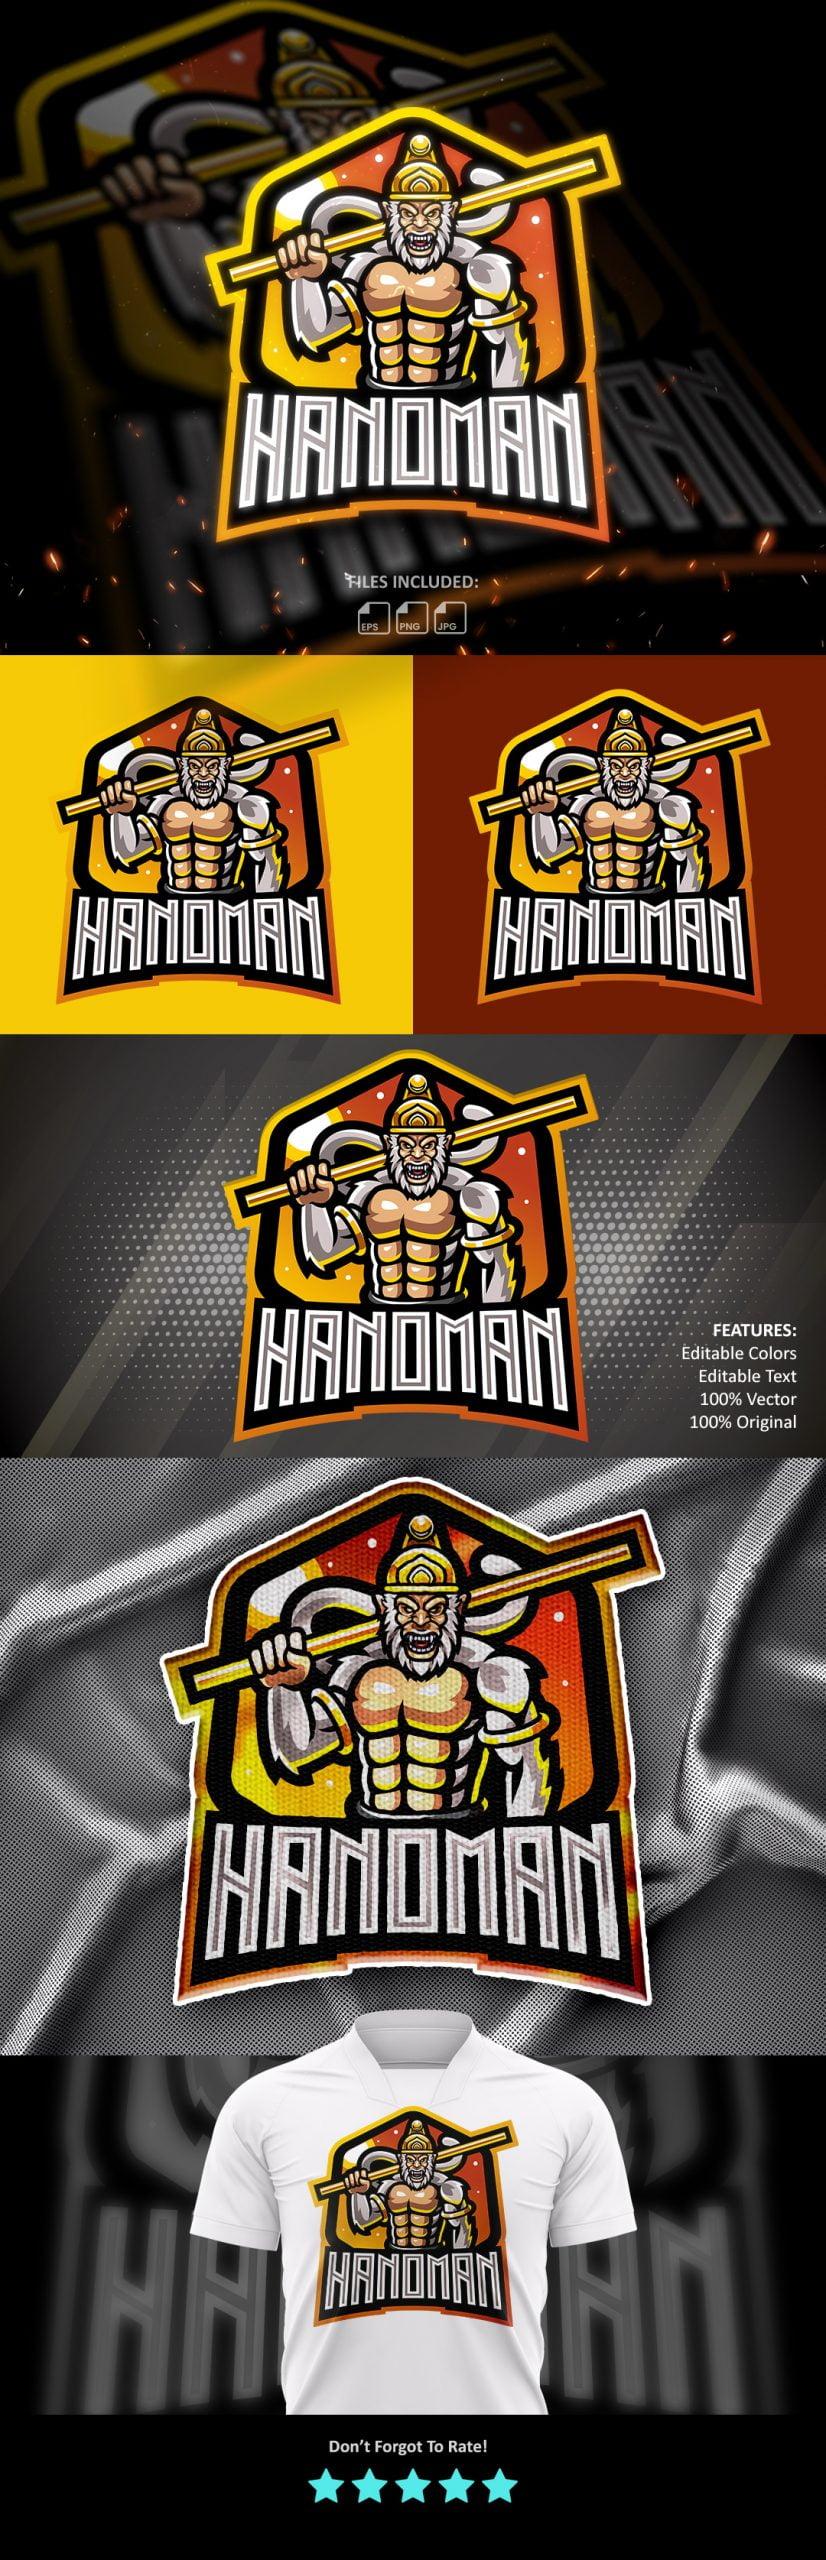 Free-Hanoman-Mascot-Logo-Download